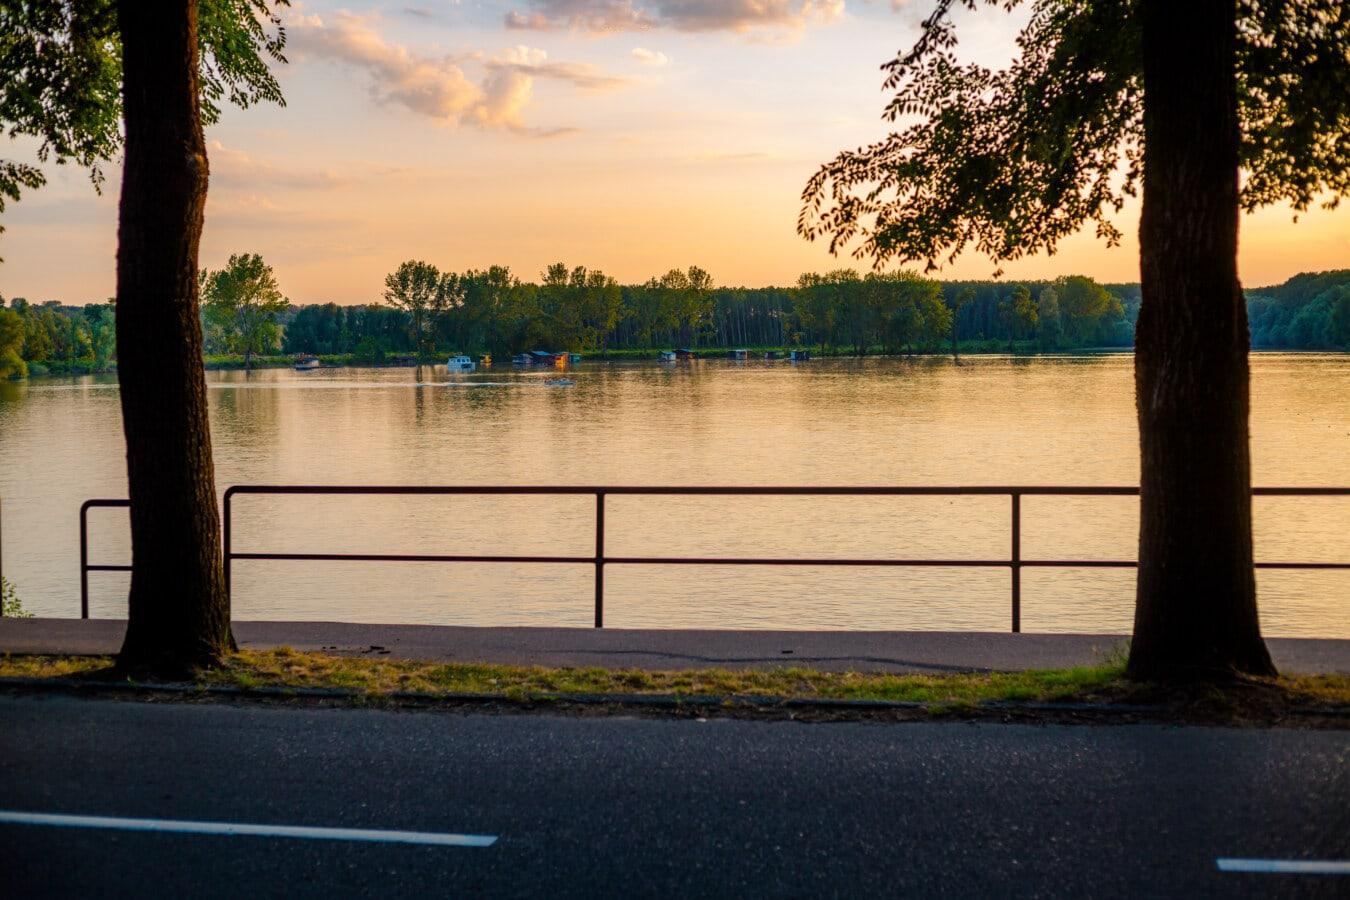 road, asphalt, lakeside, sunrise, twilight, water, tree, shore, lake, sunset